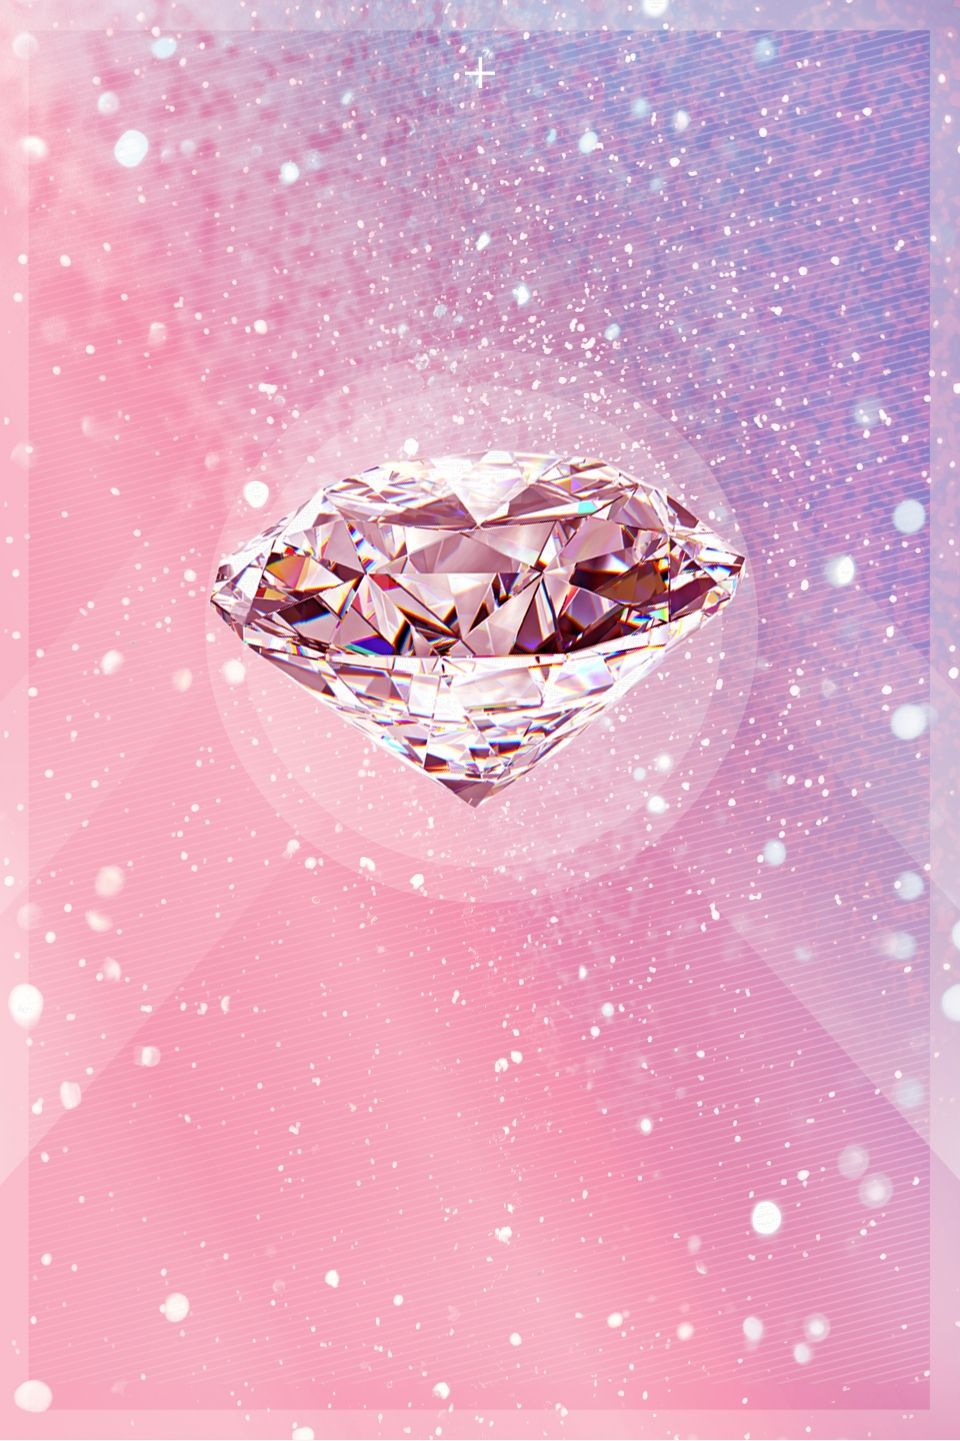 Pink Diamonds Shiny Geometric Romantic Dreamy Background Material Pink Diamond Wallpaper Pink Diamond Diamond Wallpaper